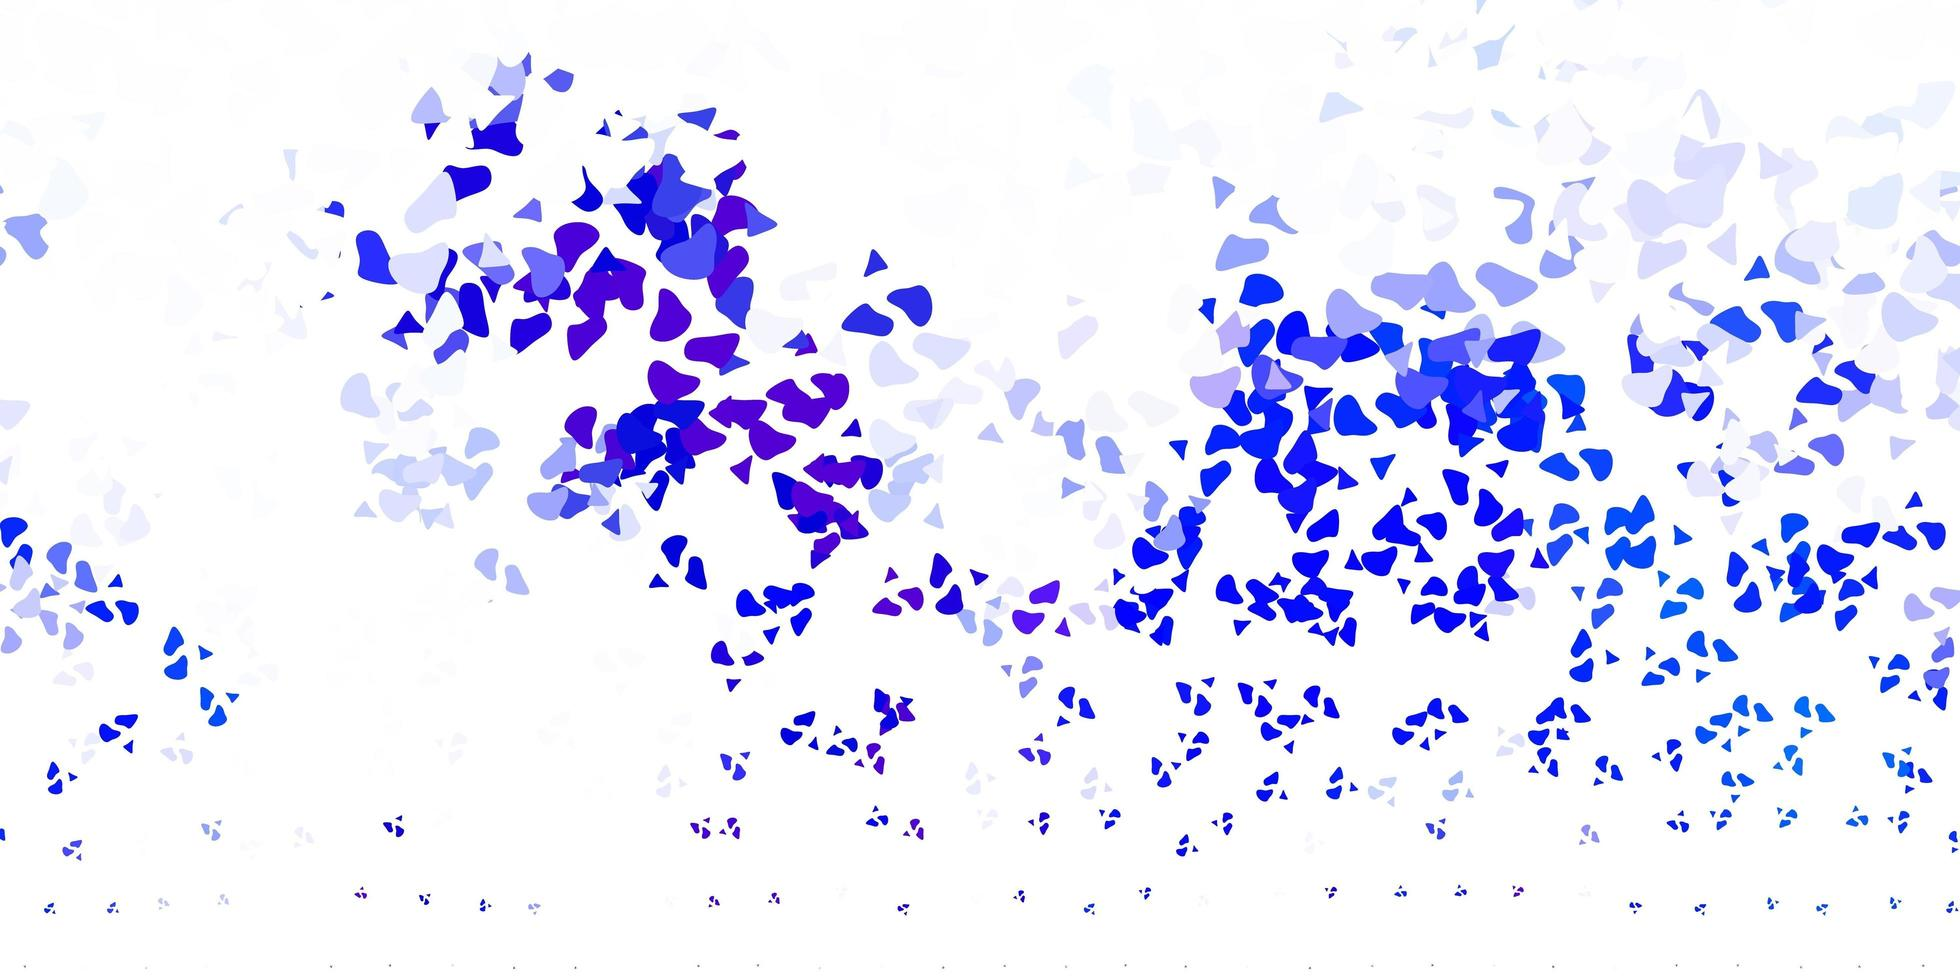 modelo de vetor azul claro com formas abstratas.